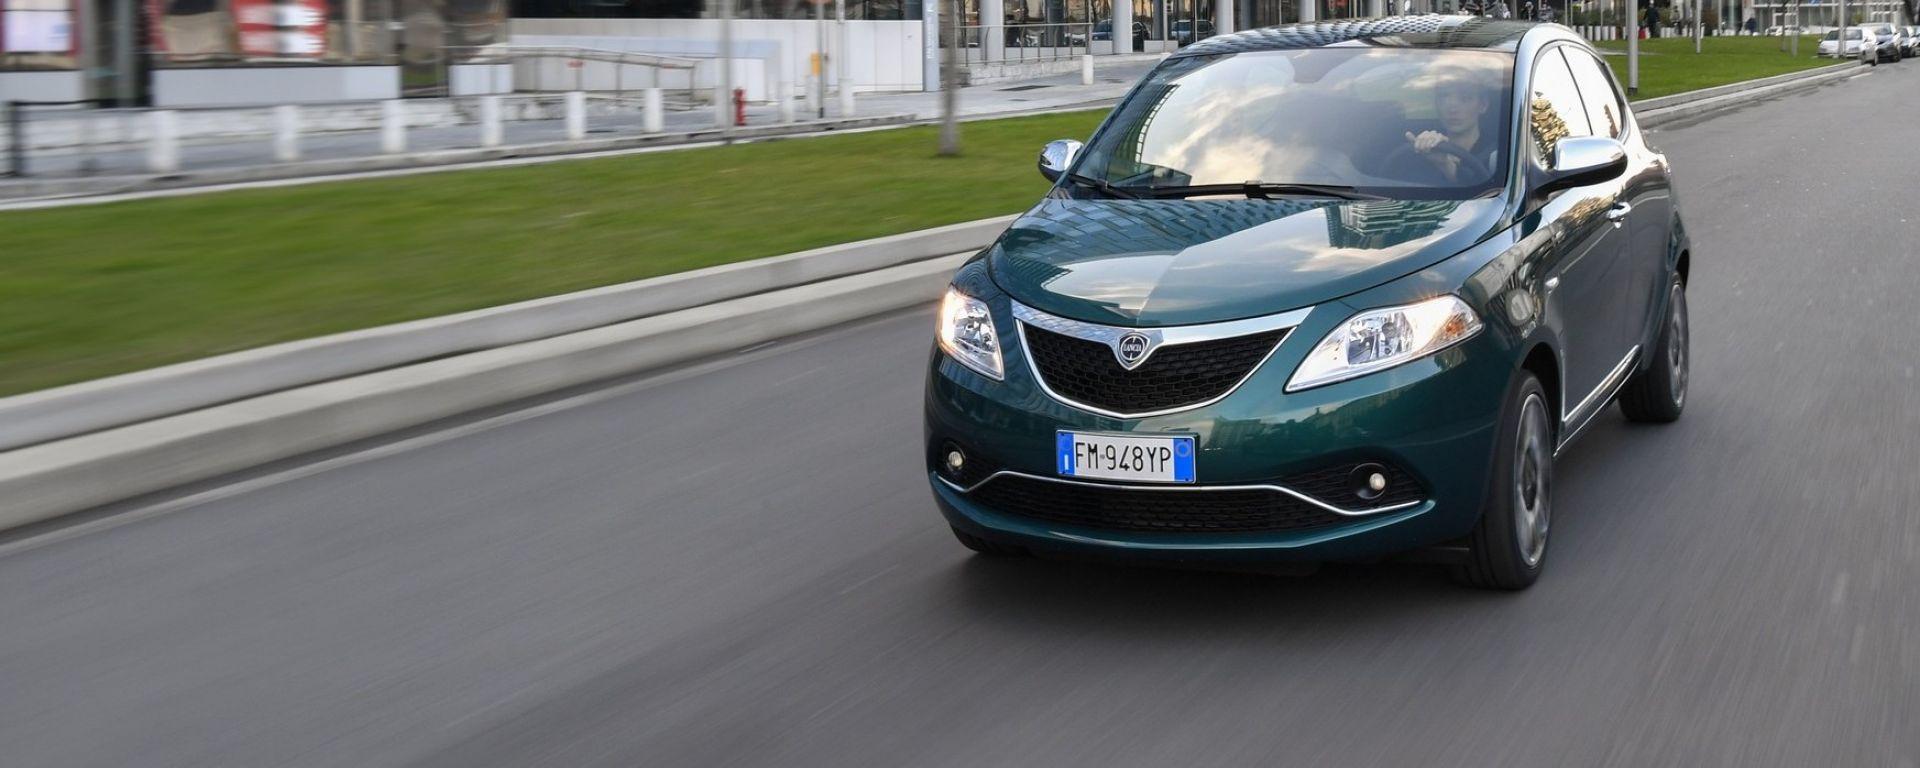 Lancia Ypsilon 2018, tre nuovi allestimenti